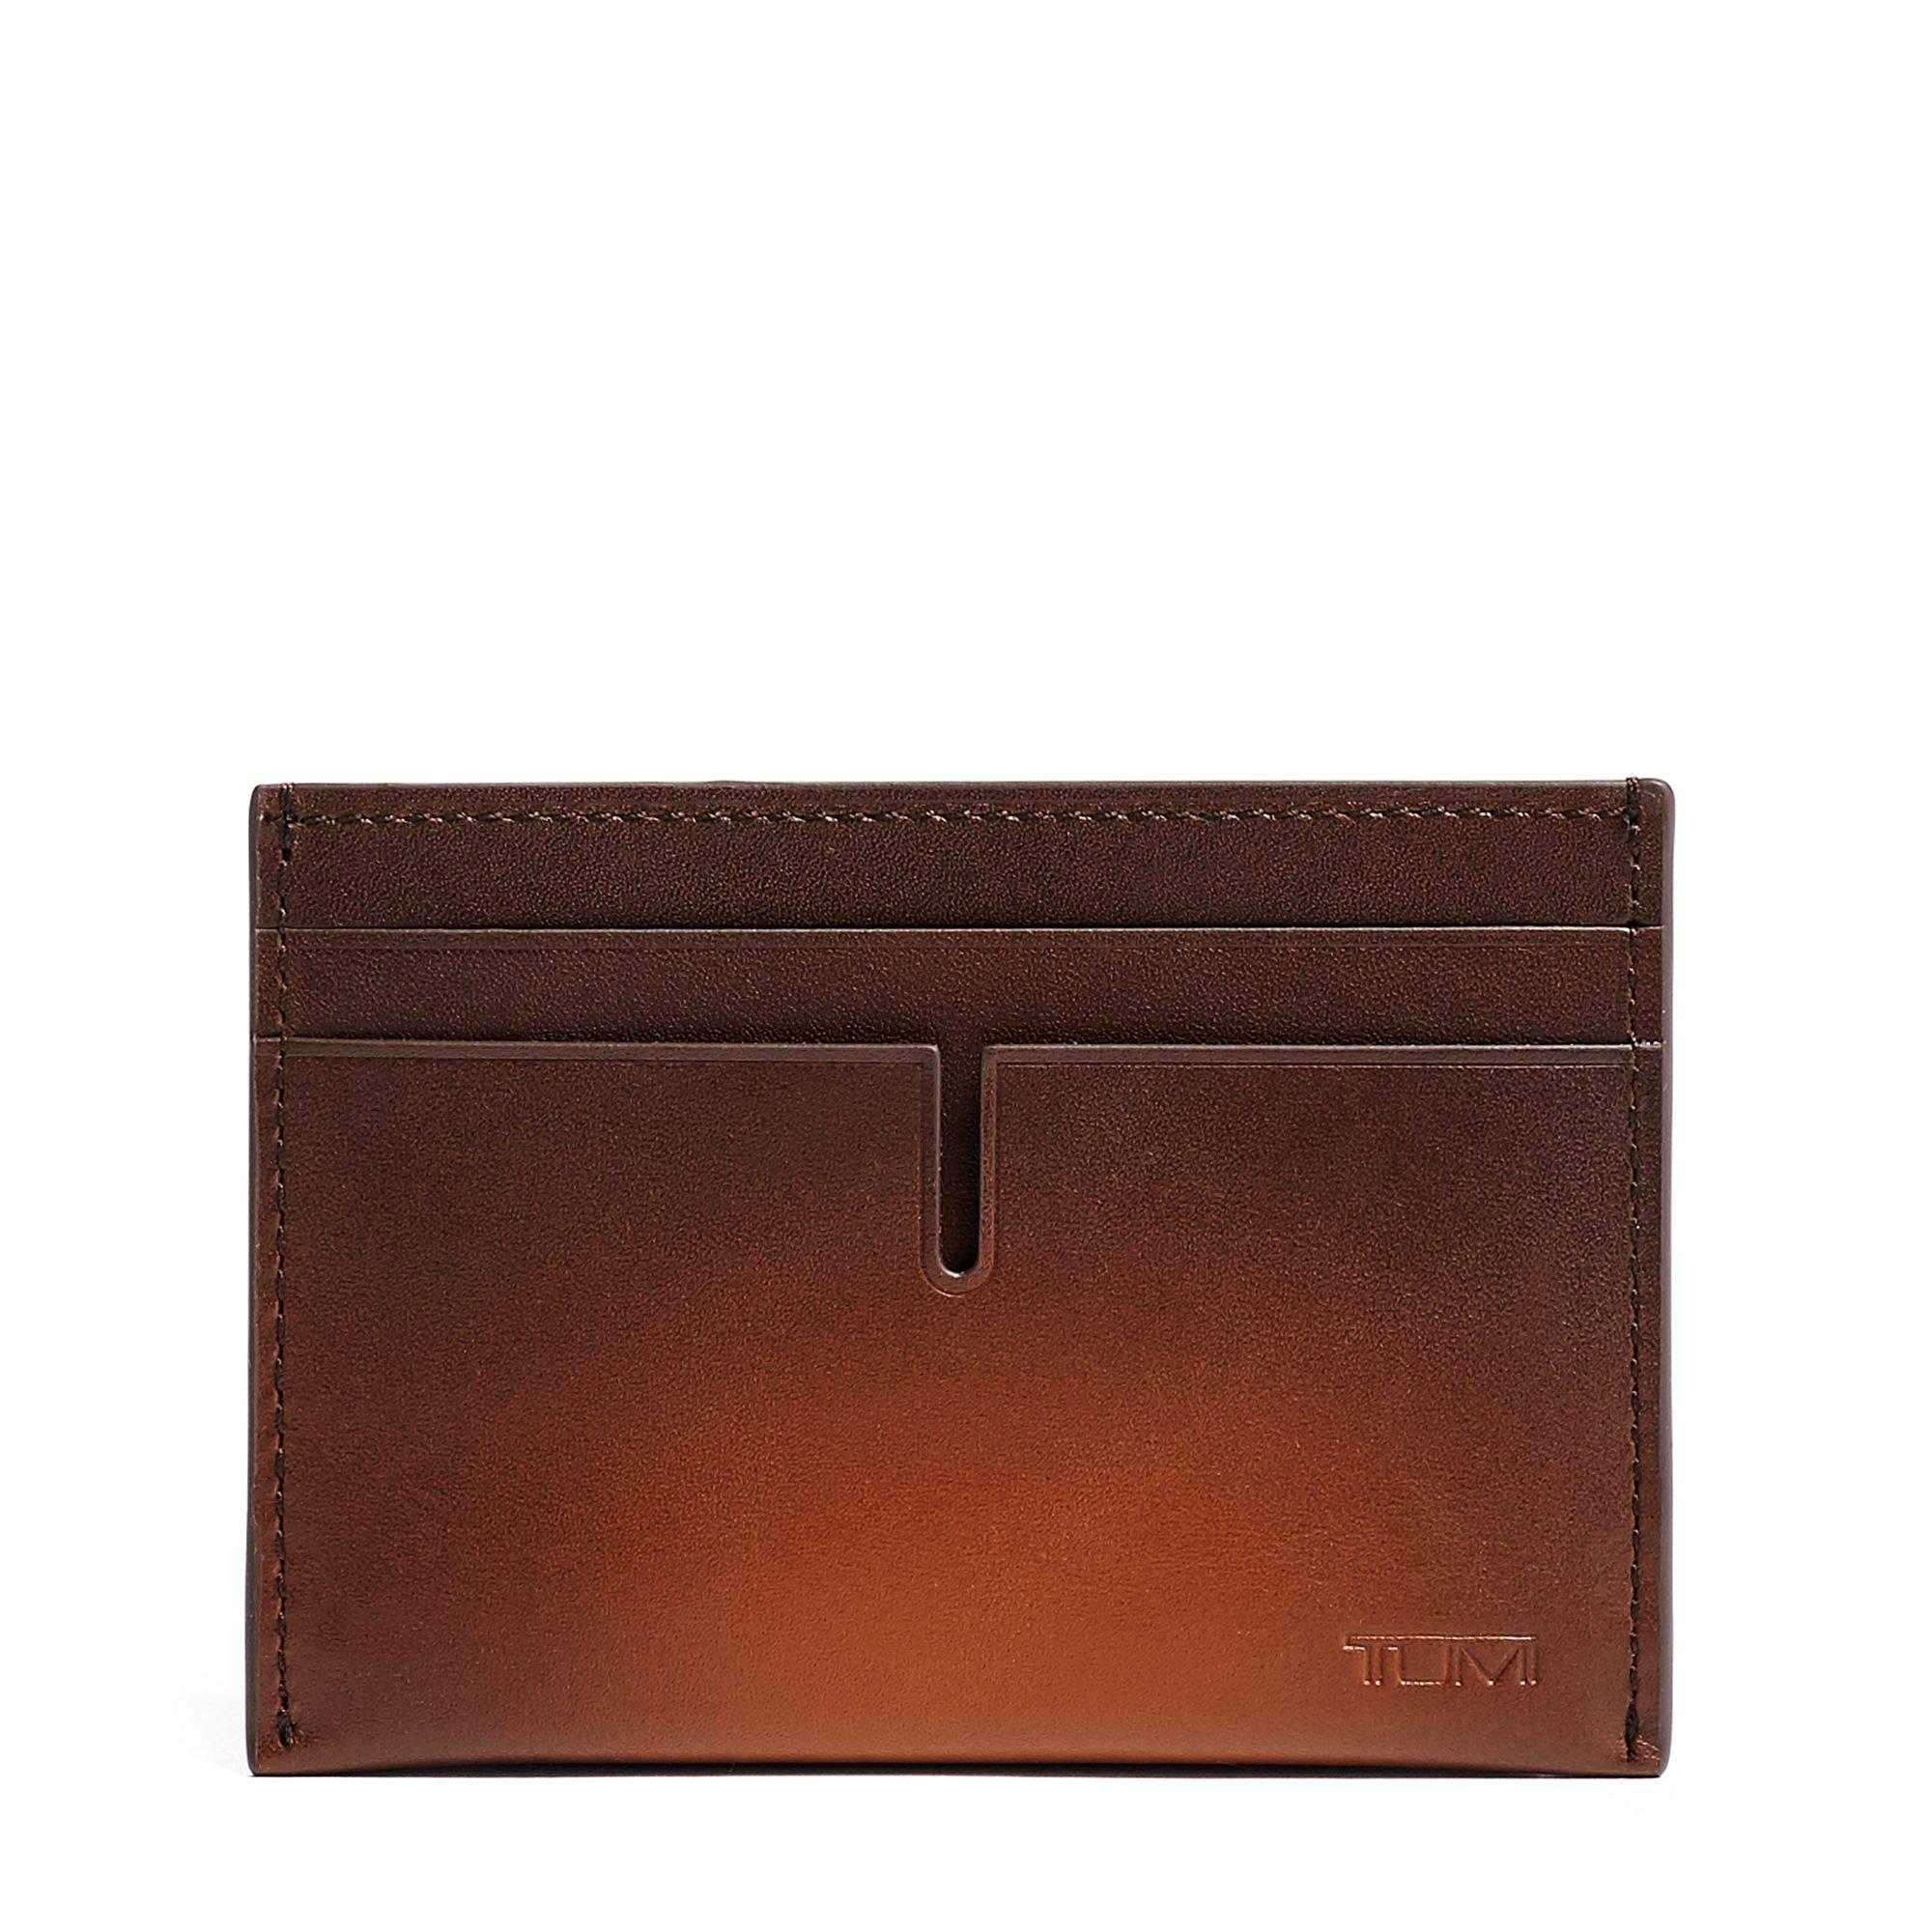 TUMI - Nassau Slim Card Case Wallet with RFID ID Lock for Men - Whiskey Burnished